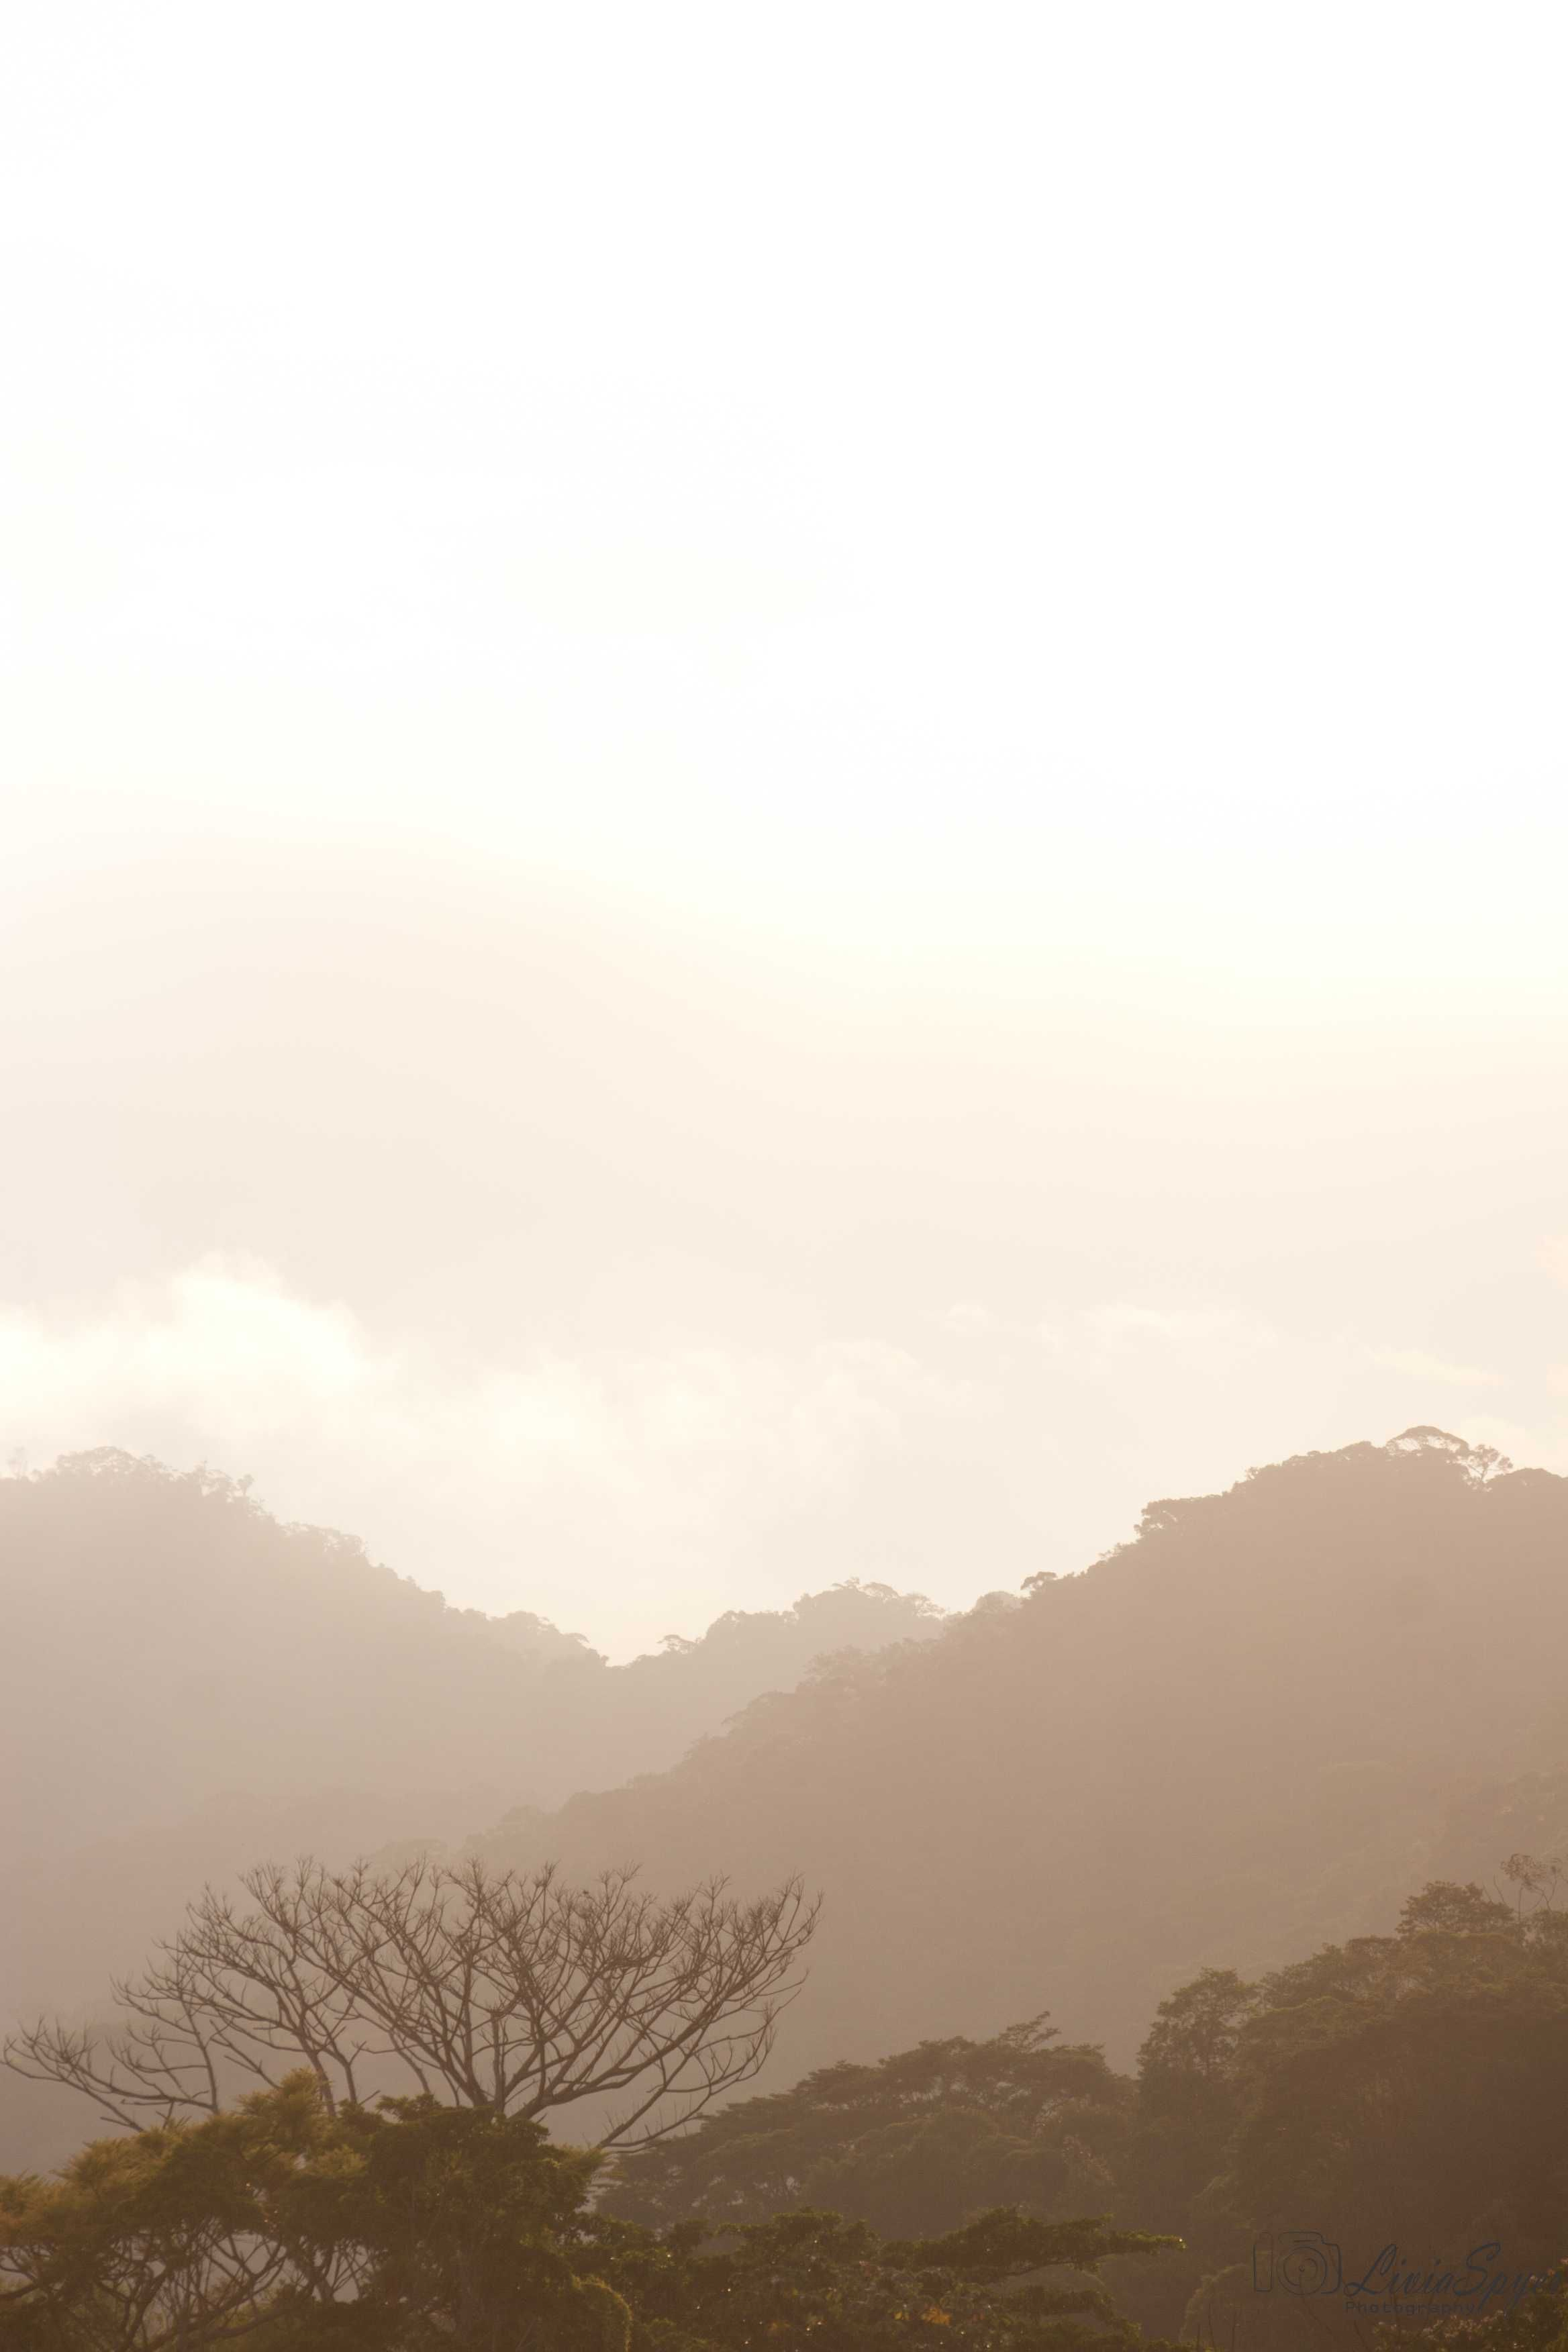 paisagem montanhas #liviaspyer #liviaspyerphotography